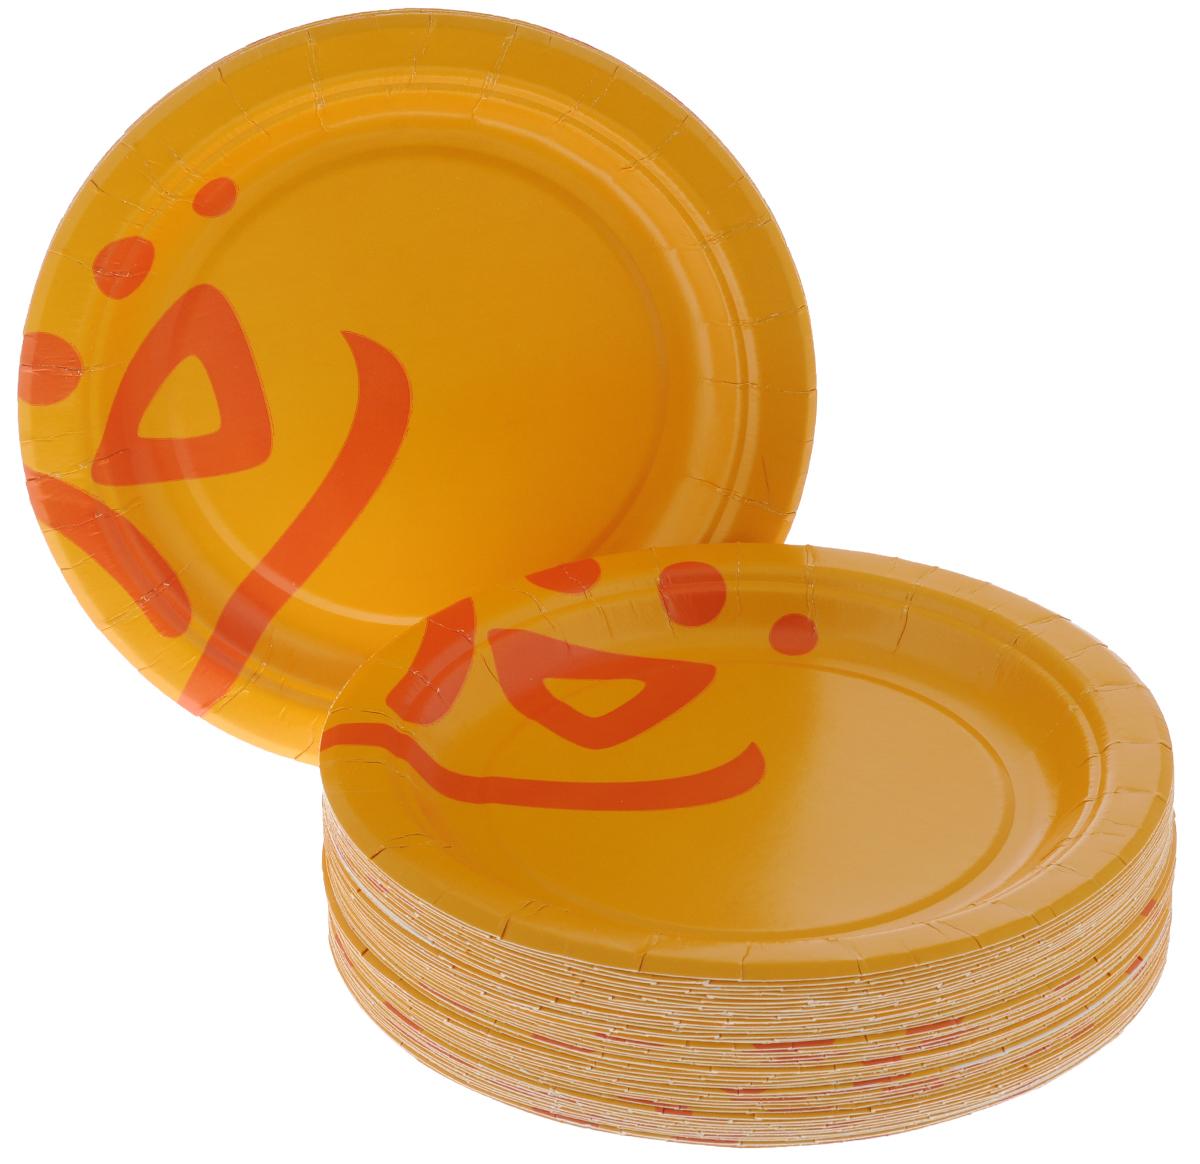 Набор одноразовых тарелок Huhtamaki Whizz, диаметр 18 см, 50 шт набор одноразовых тарелок huhtamaki whizz цвет оранжевый диаметр 23 см 50 шт